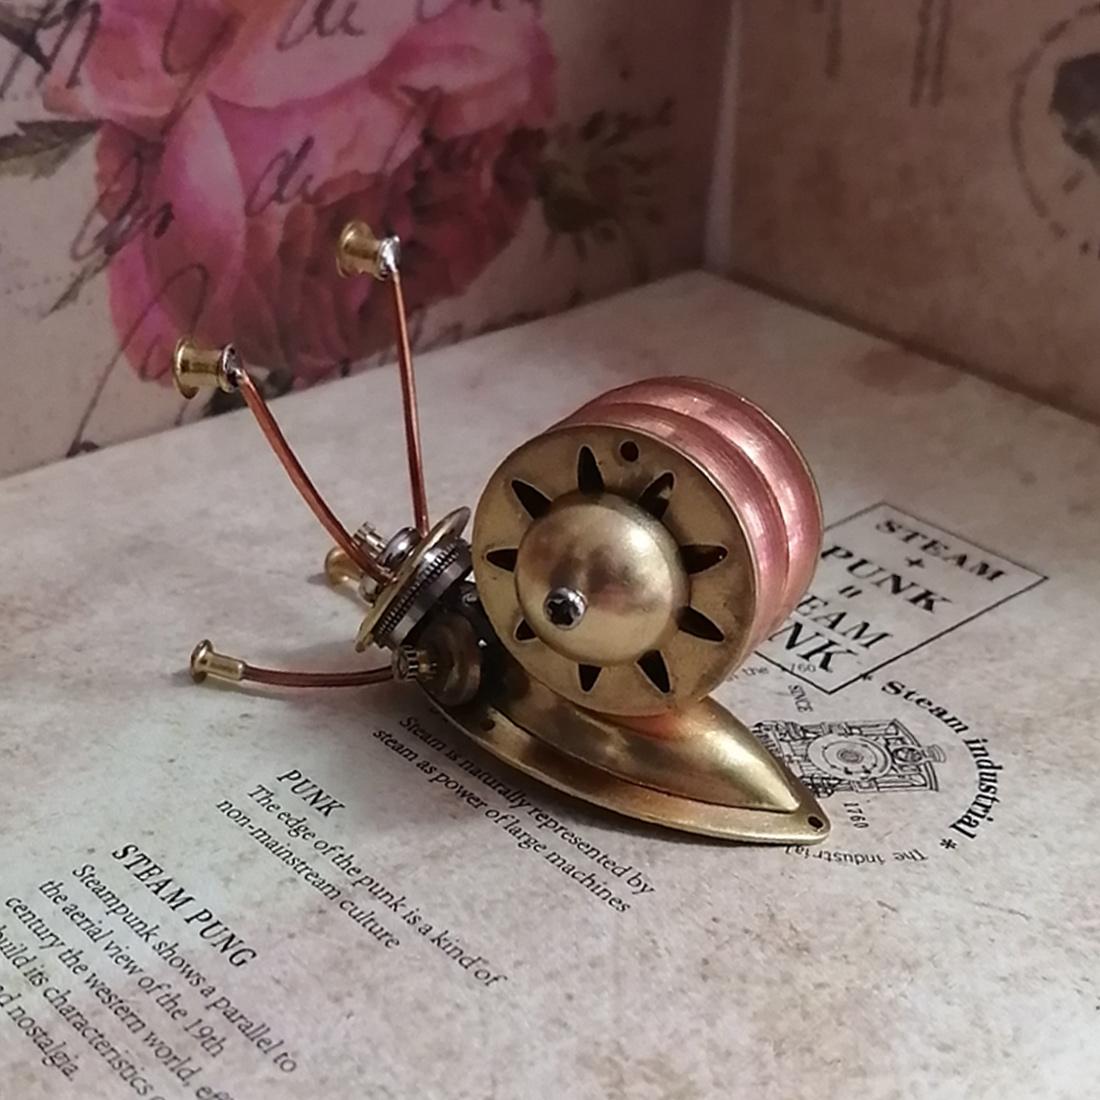 Snail 3D Puzzle Metal Mechanical Animal Model Kits